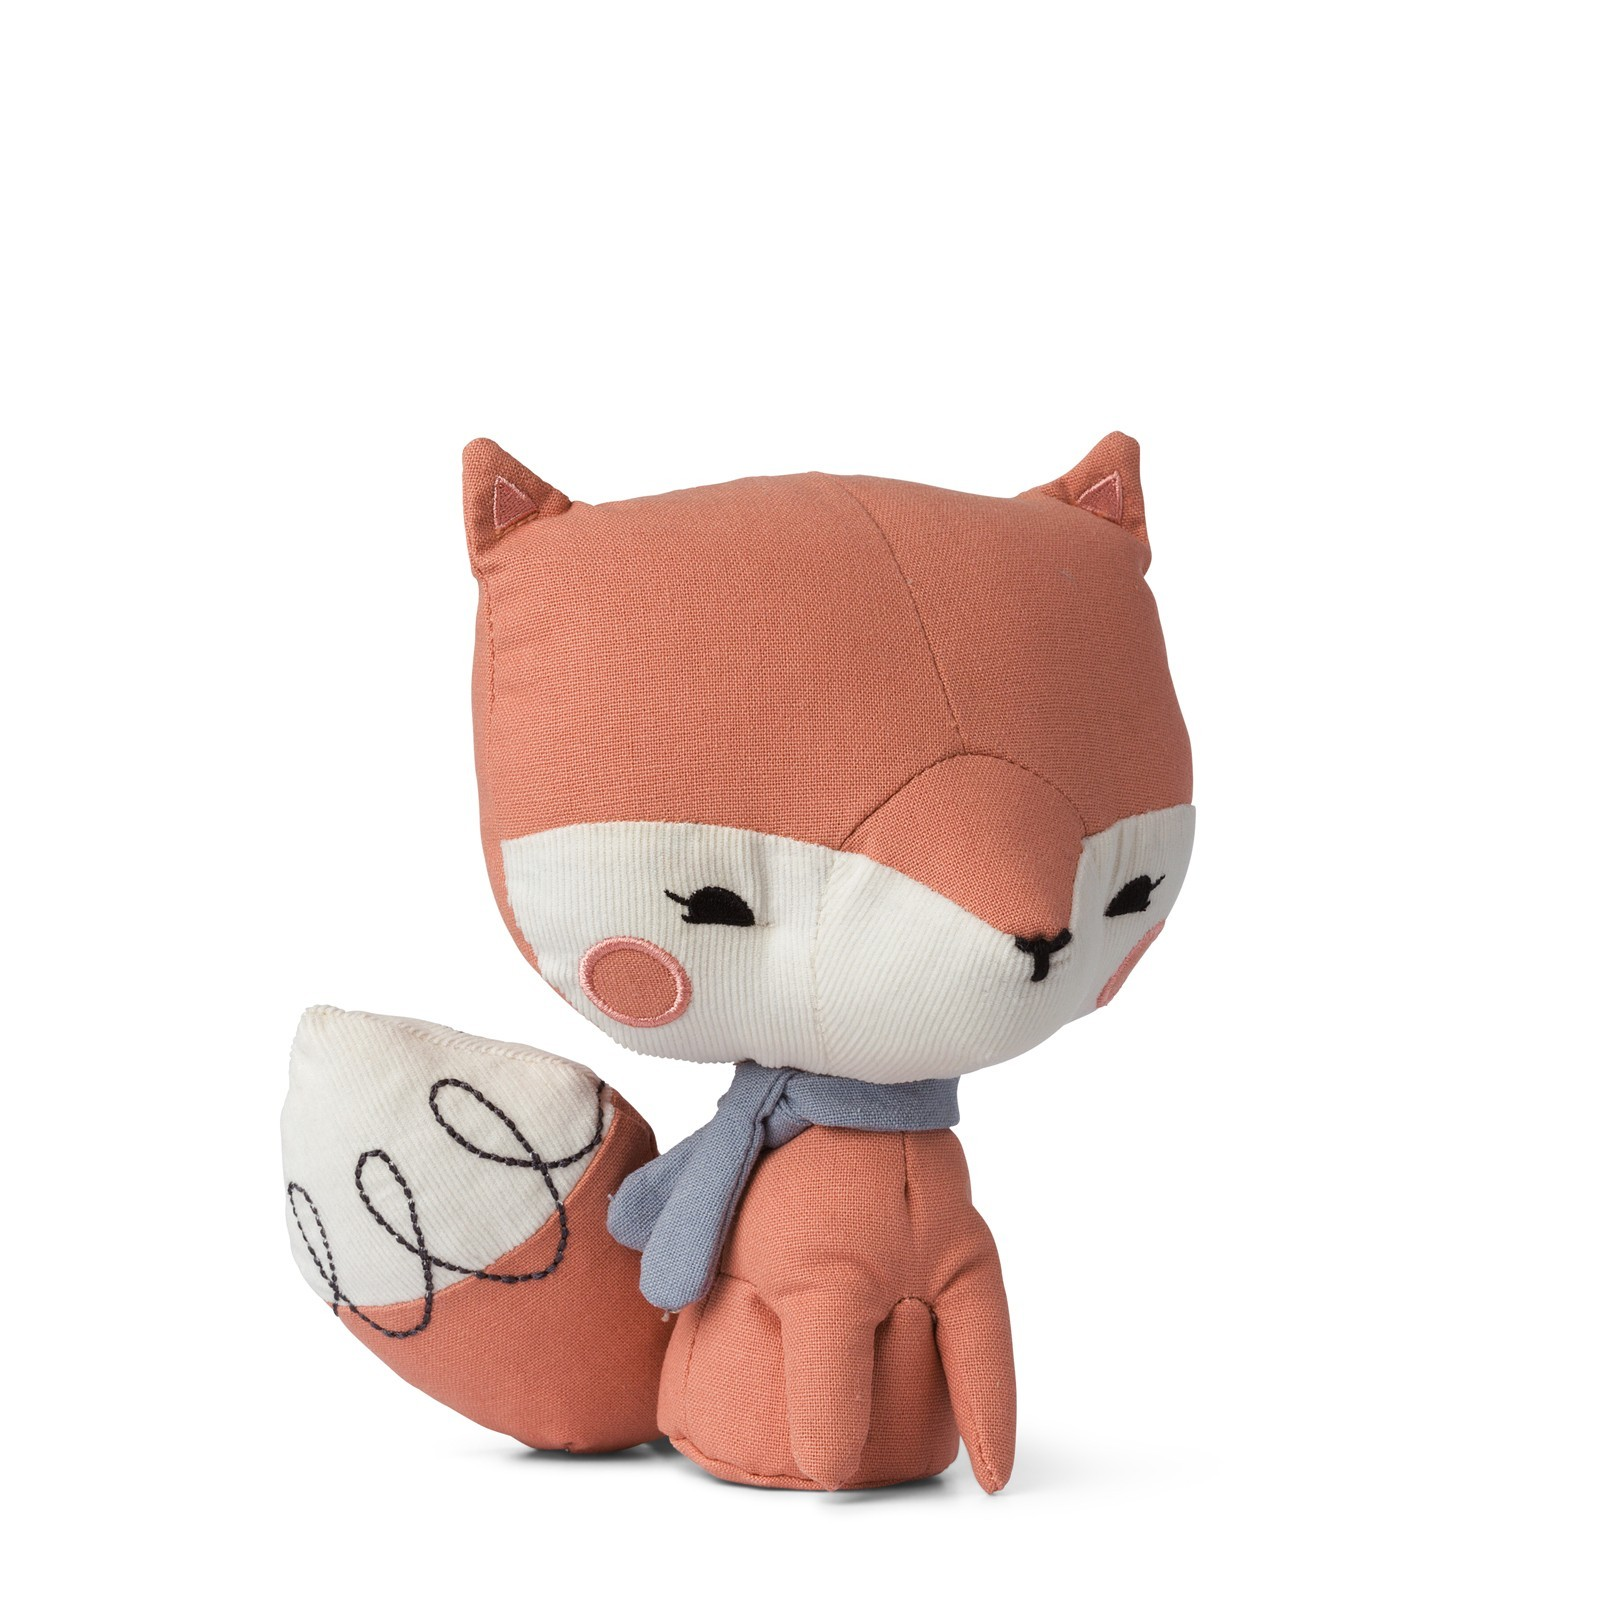 Plyšová líška staroružová v škatuľke- Picca Loulou (18 cm)